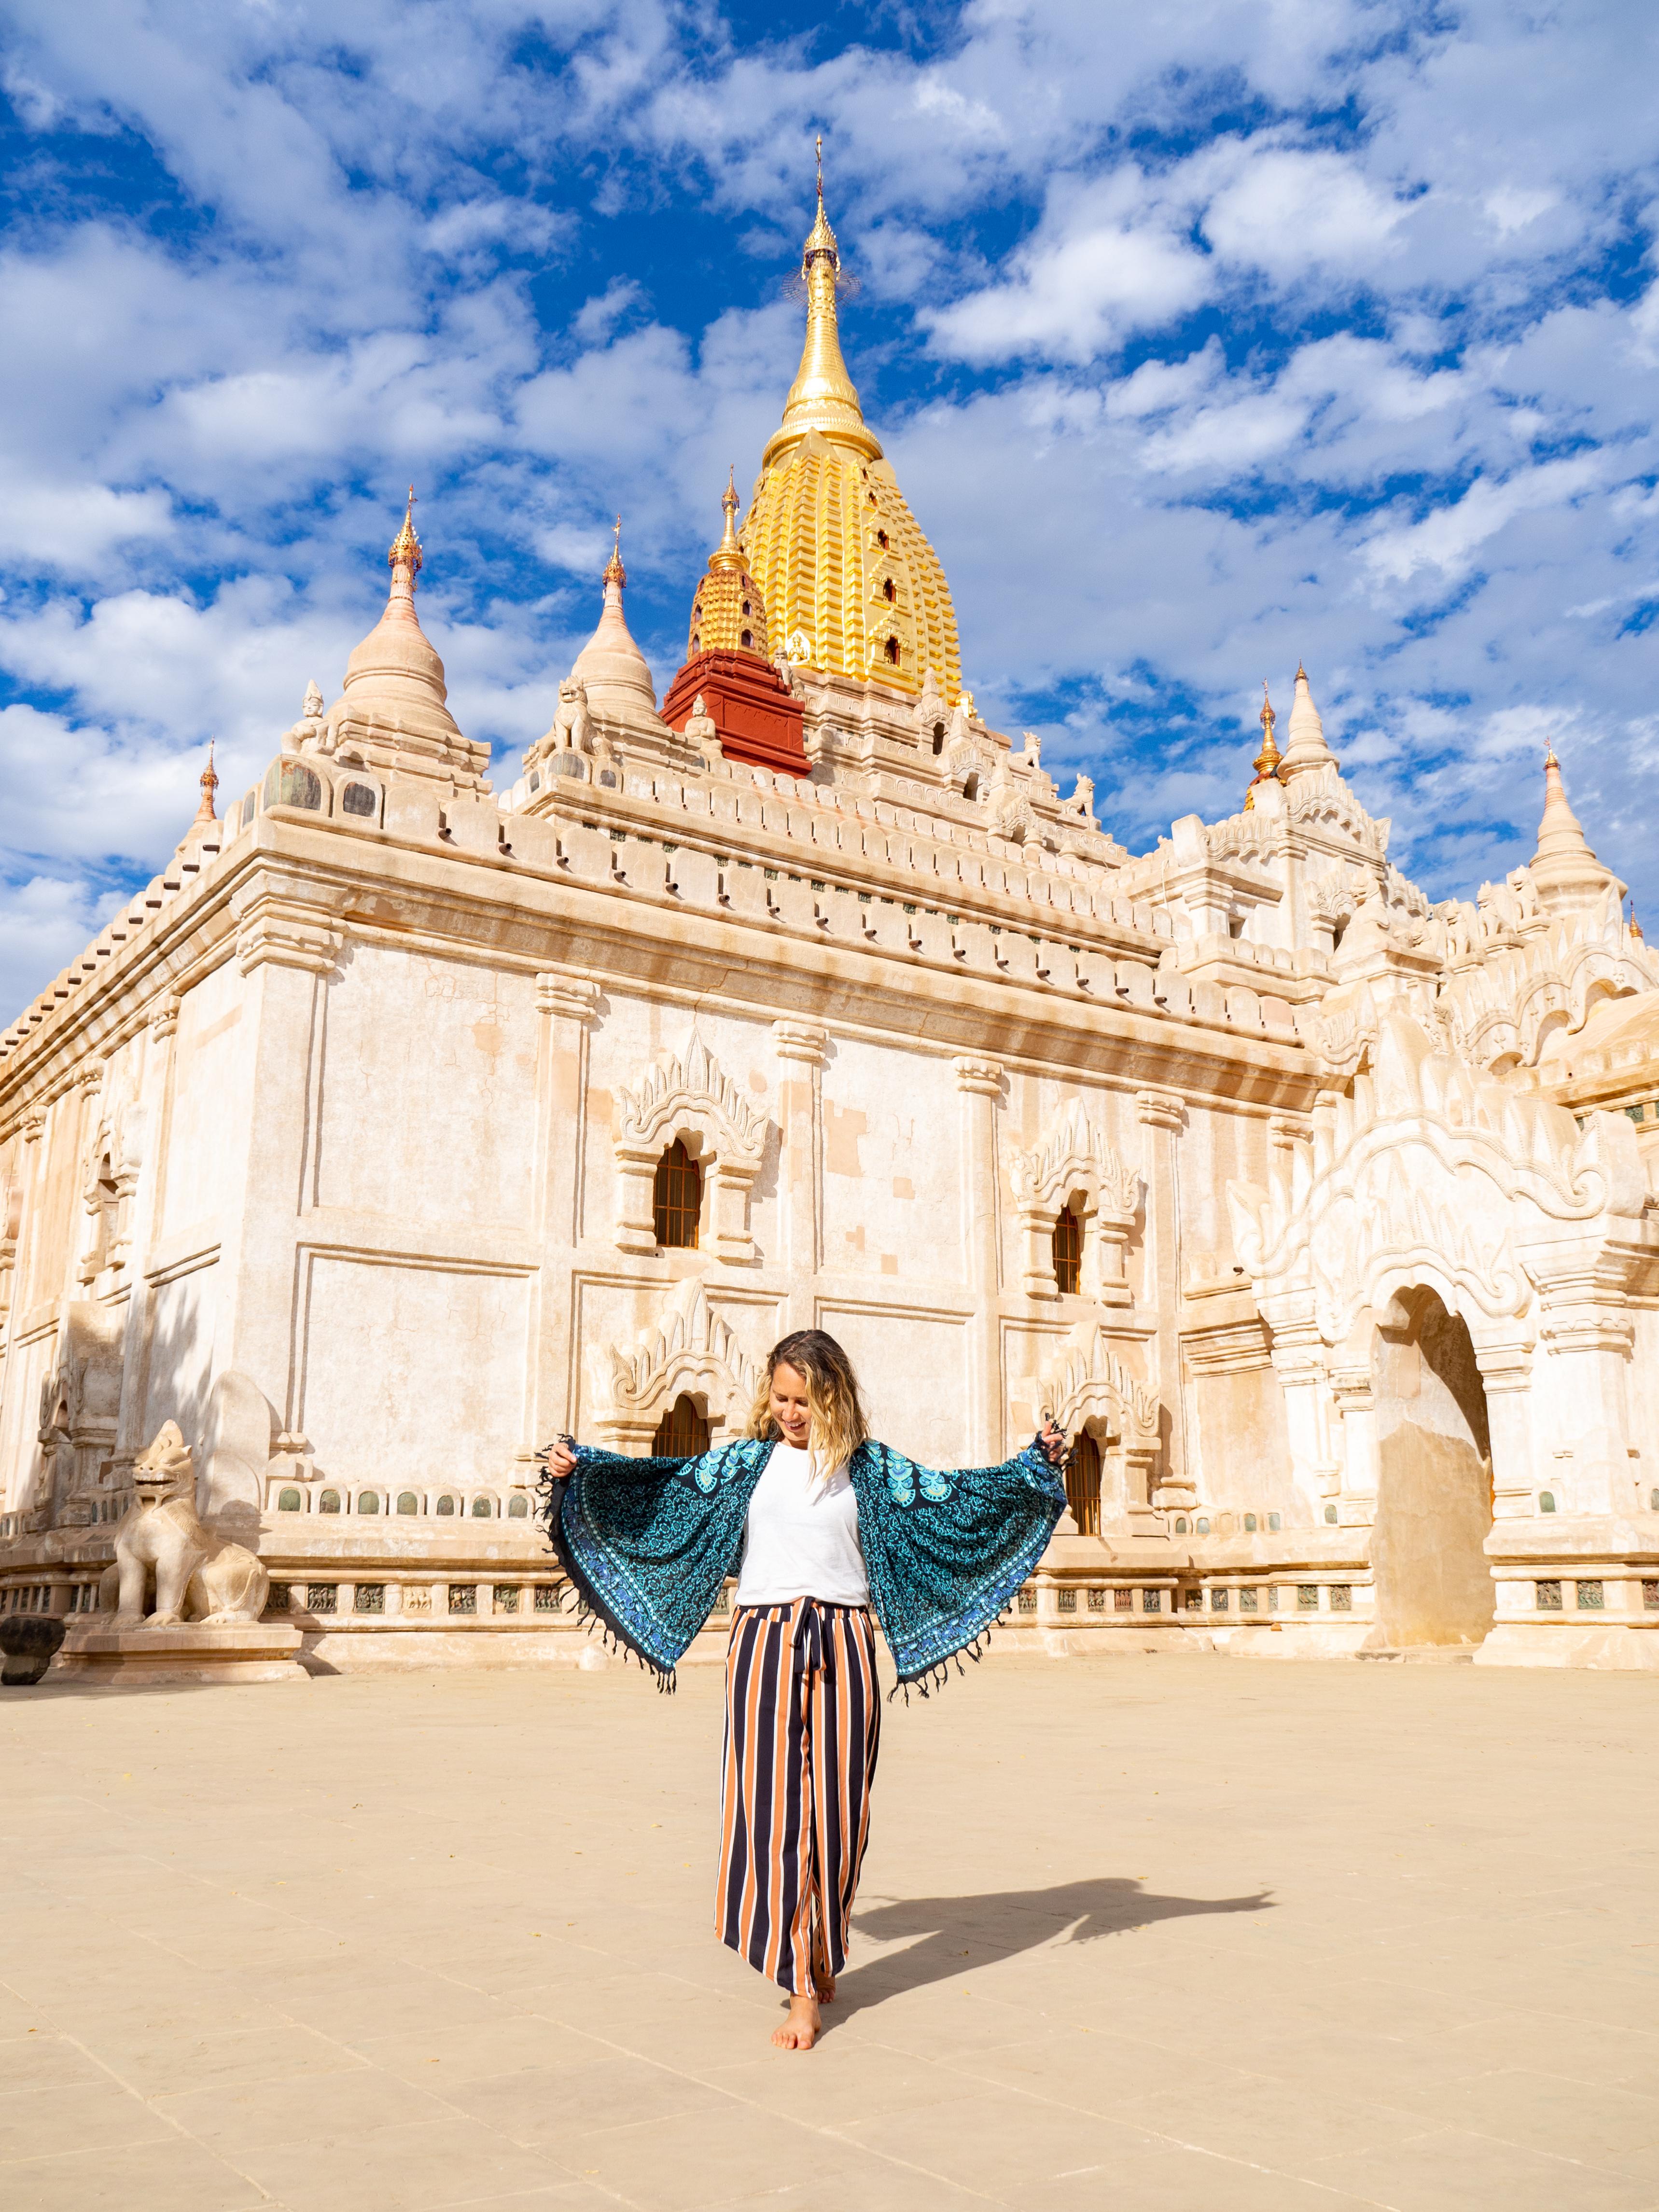 things to do in bagan, what to do in bagan, bagan, bagan tour, e bike bagan, bagan travel, bagan temples, bagan attractions, new bagan, old bagan, bagan itinerary, sunset bagan, ananda temple